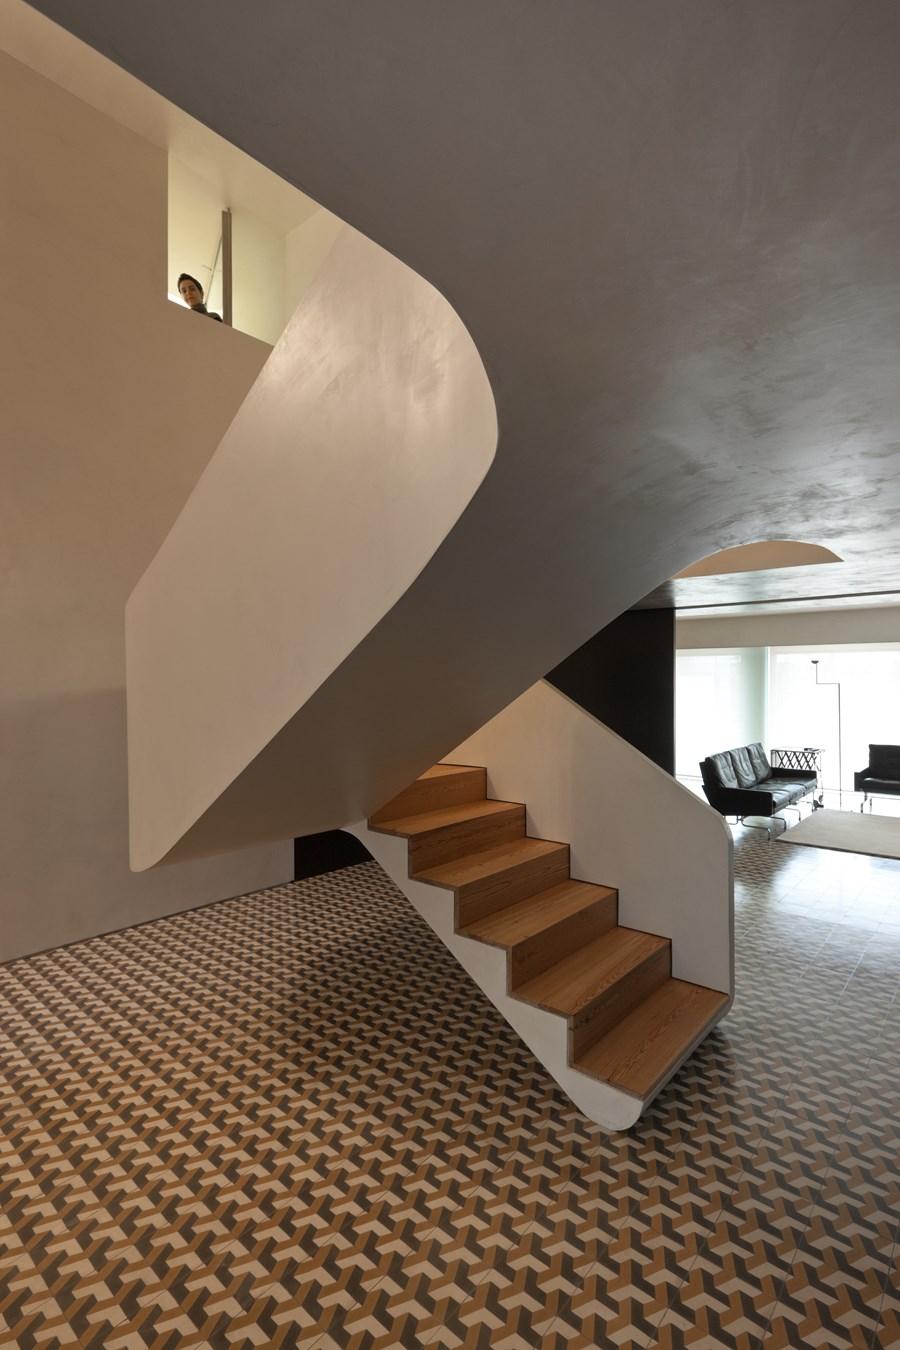 Rehabilitation of an apartment by Correia Ragazzi Arquitectos 11